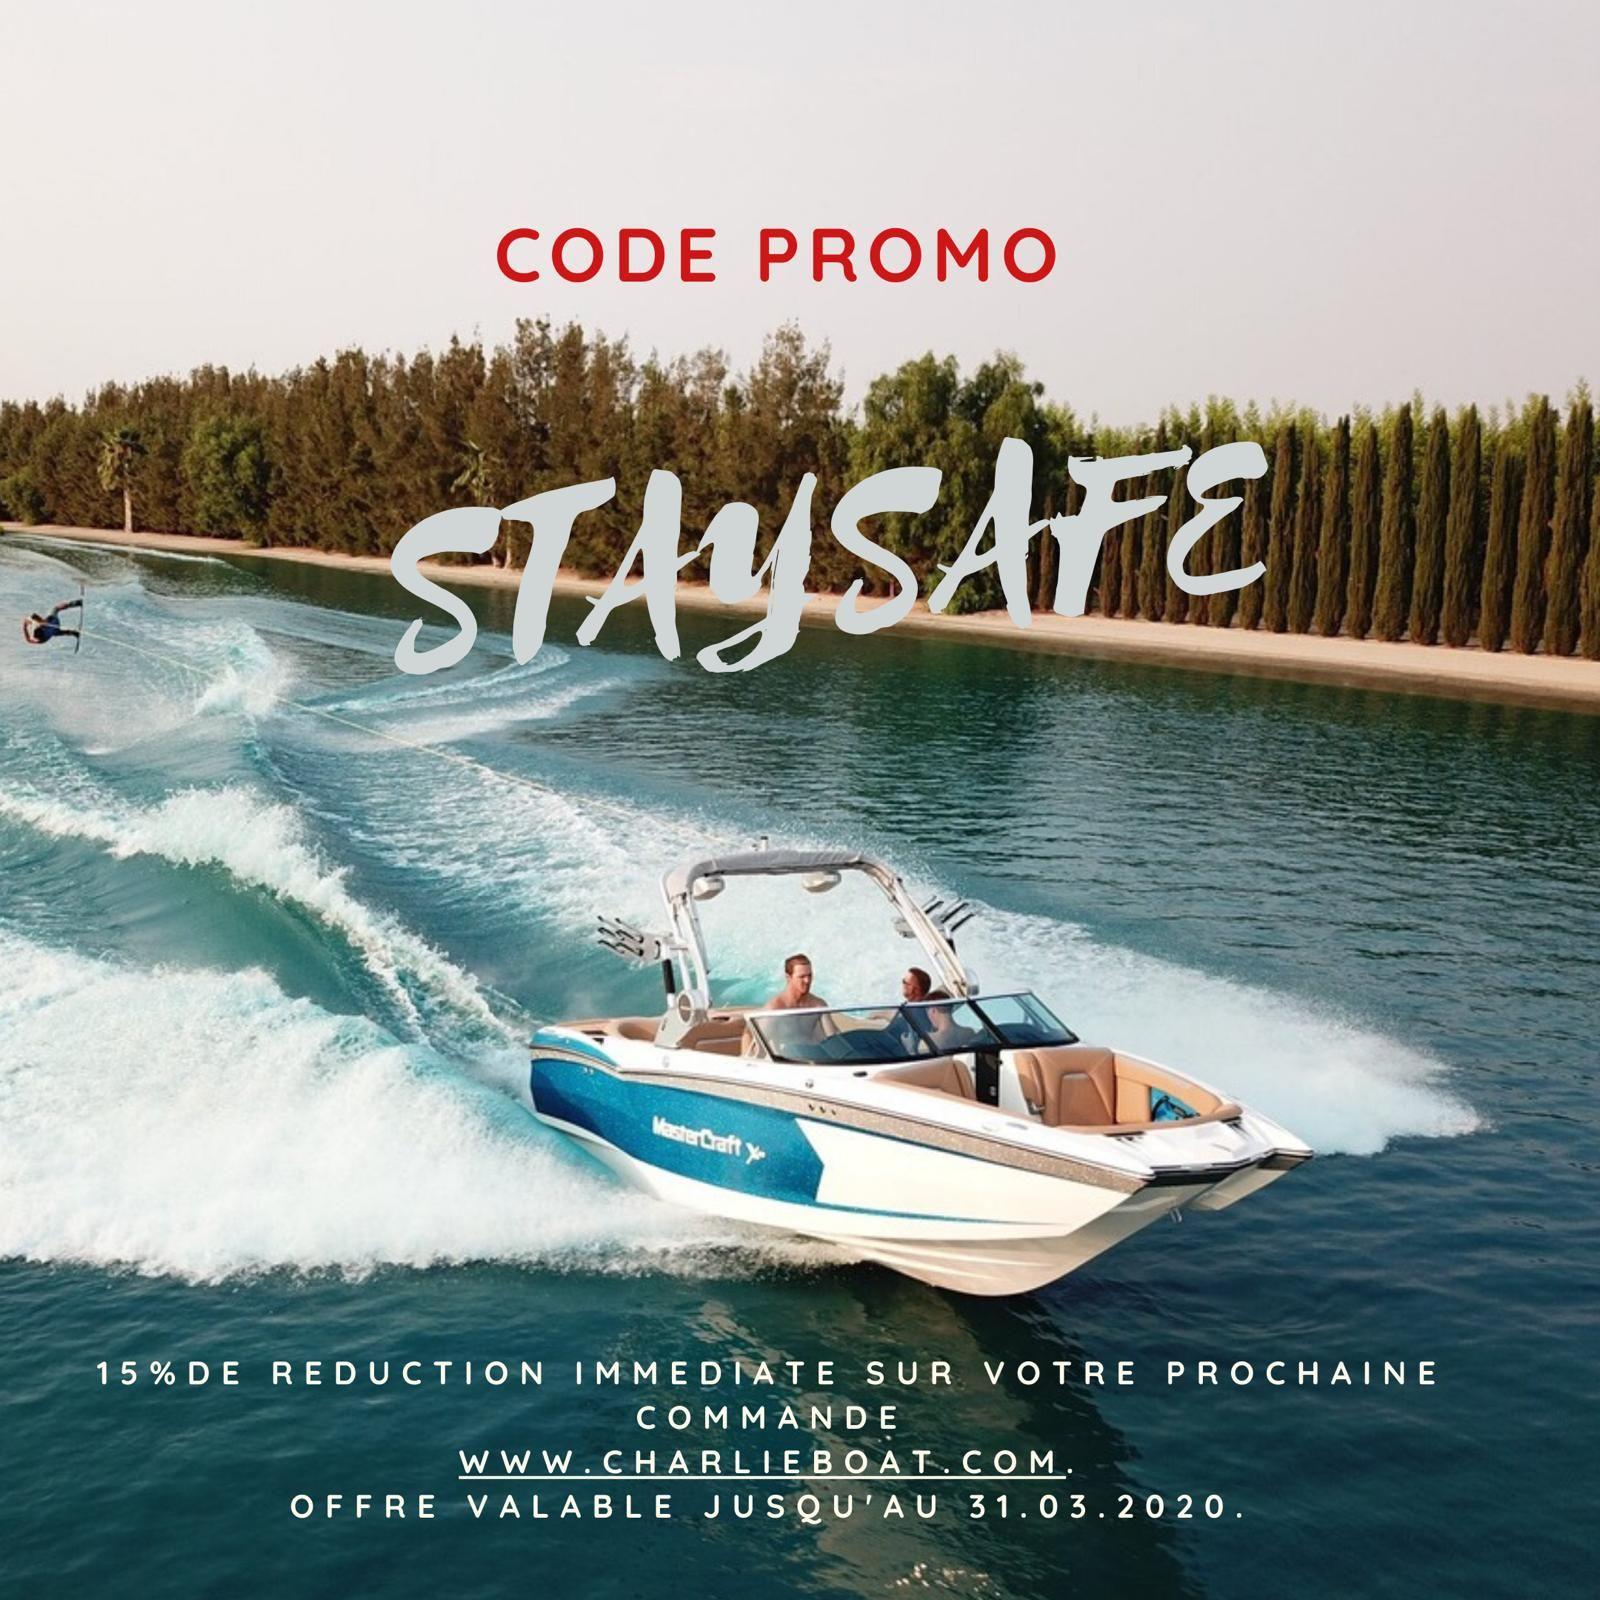 Code Promo 15 Charlieboat Com Bassin D Arcachon Arcachon Faire Du Sport